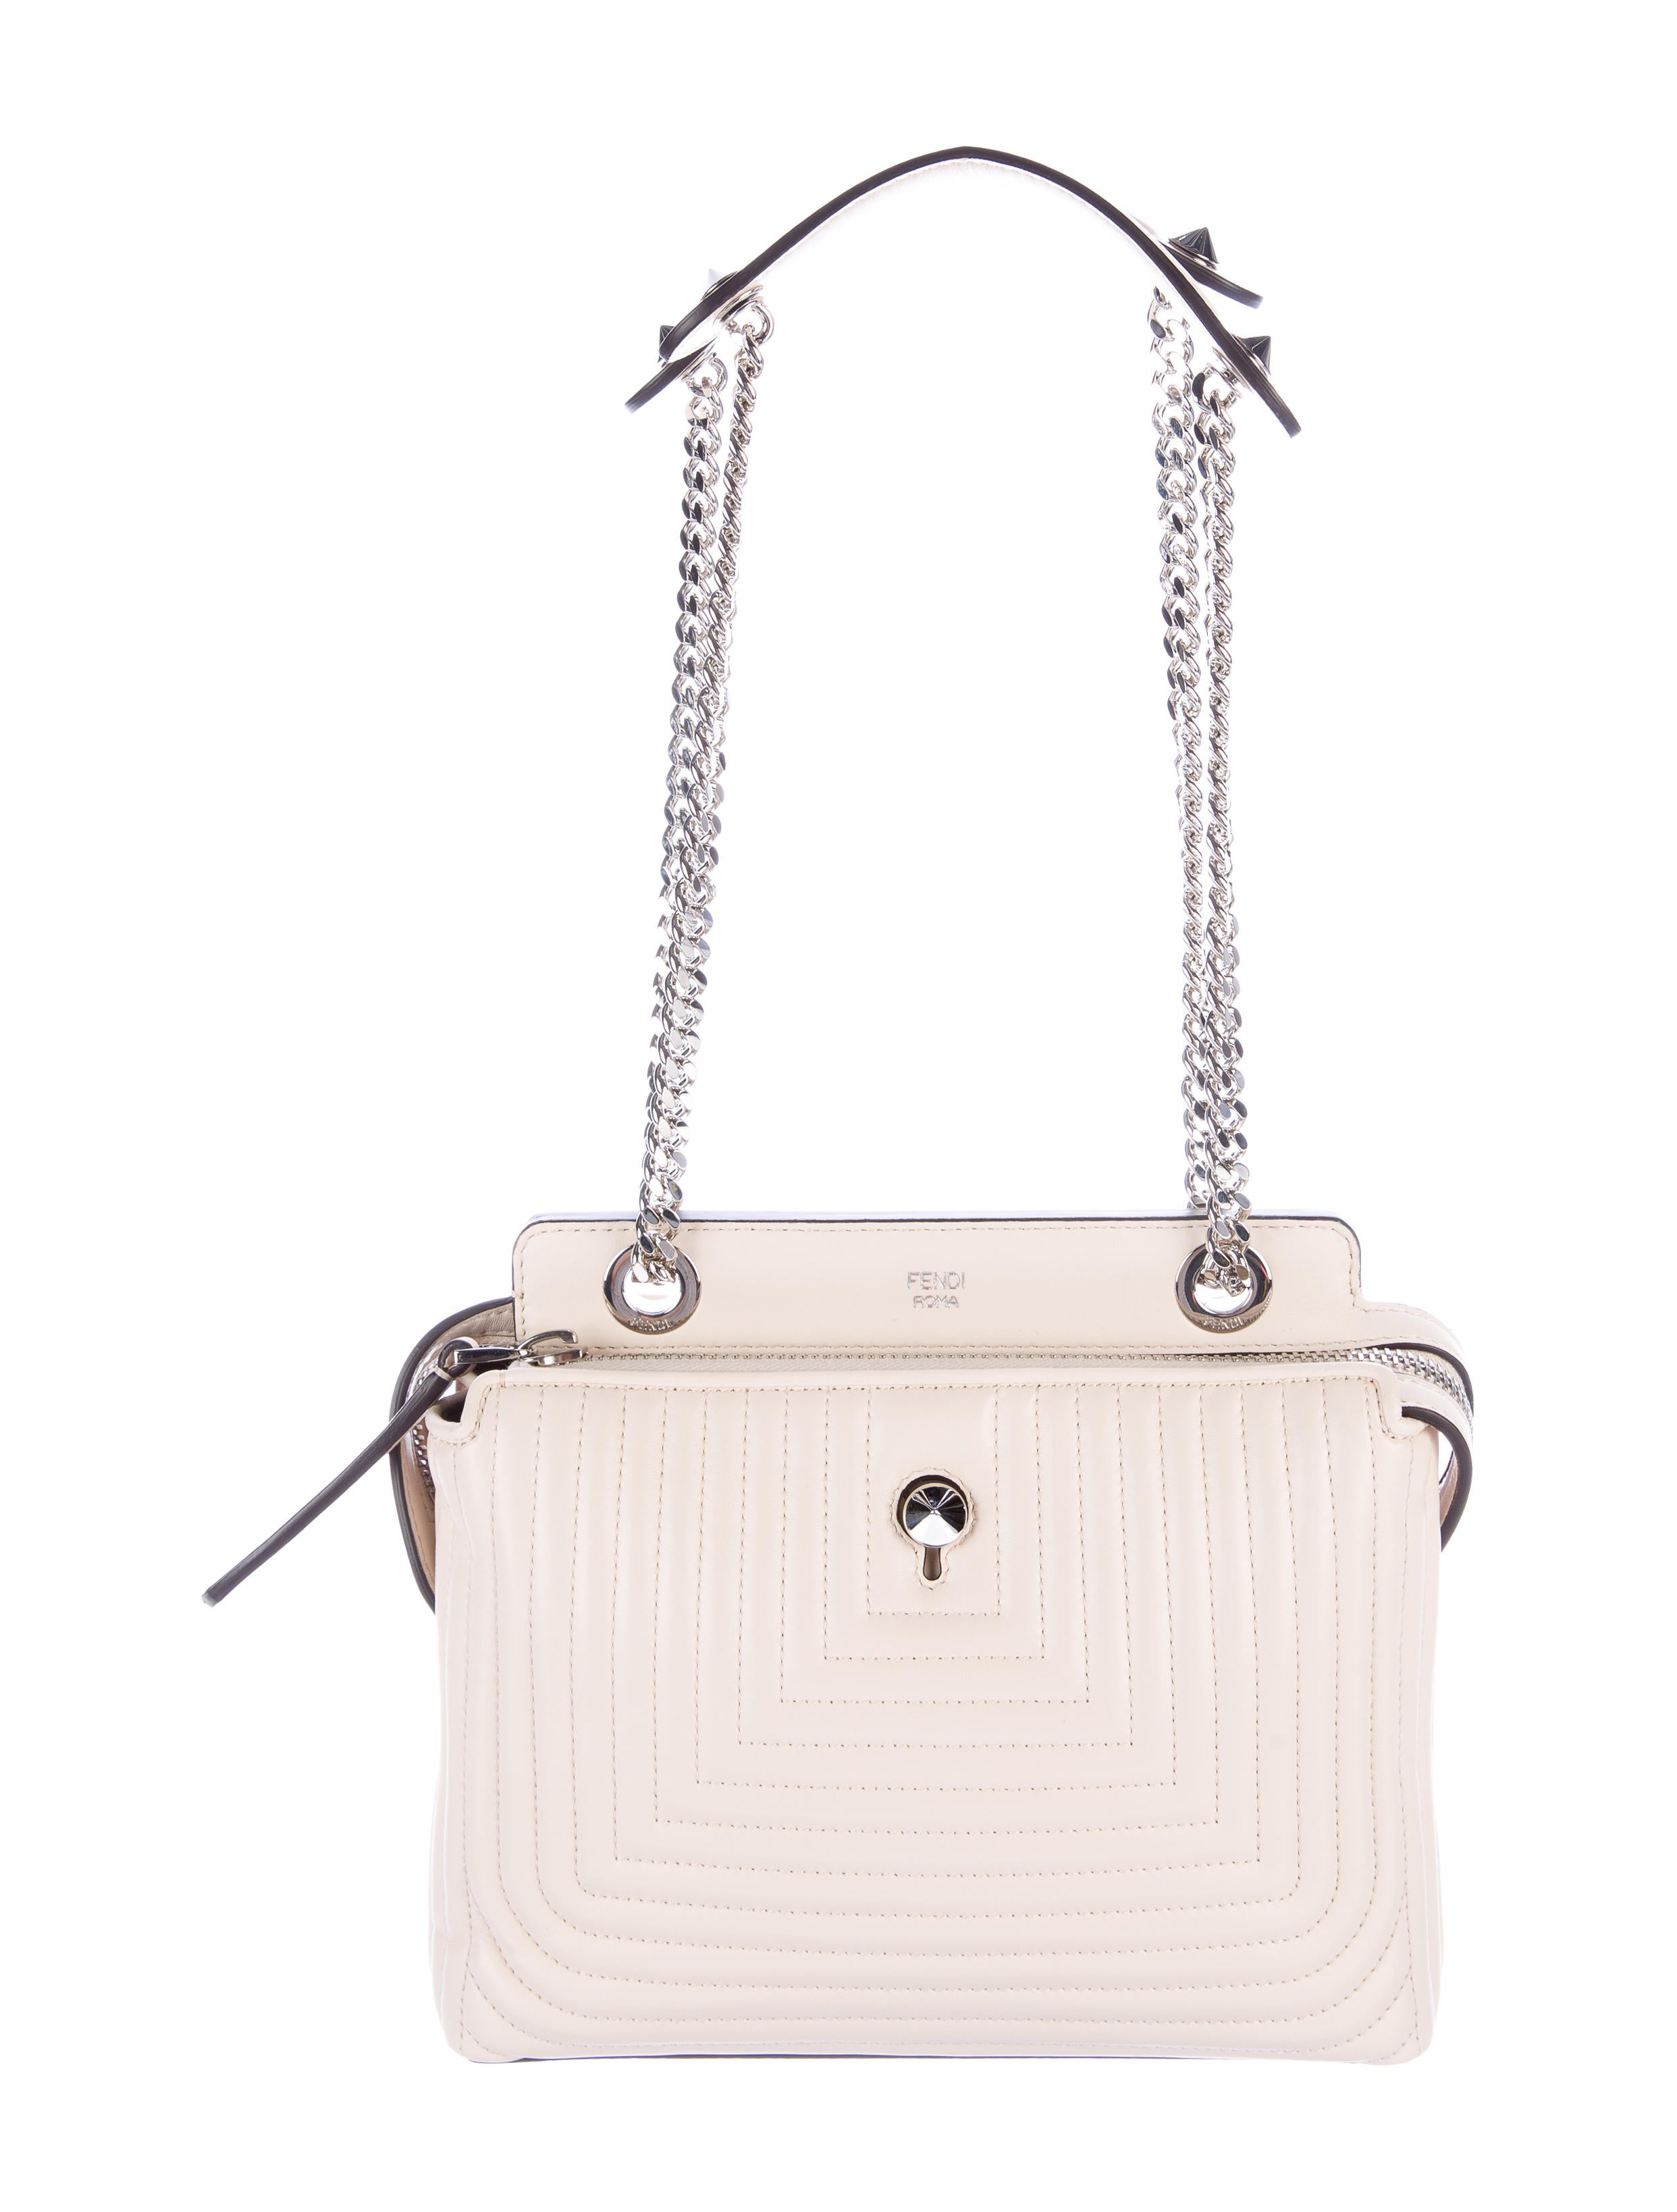 6a7744822ced Fendi Dotcom Click Small Quilted Chain Shoulder Bag - Handbags ...